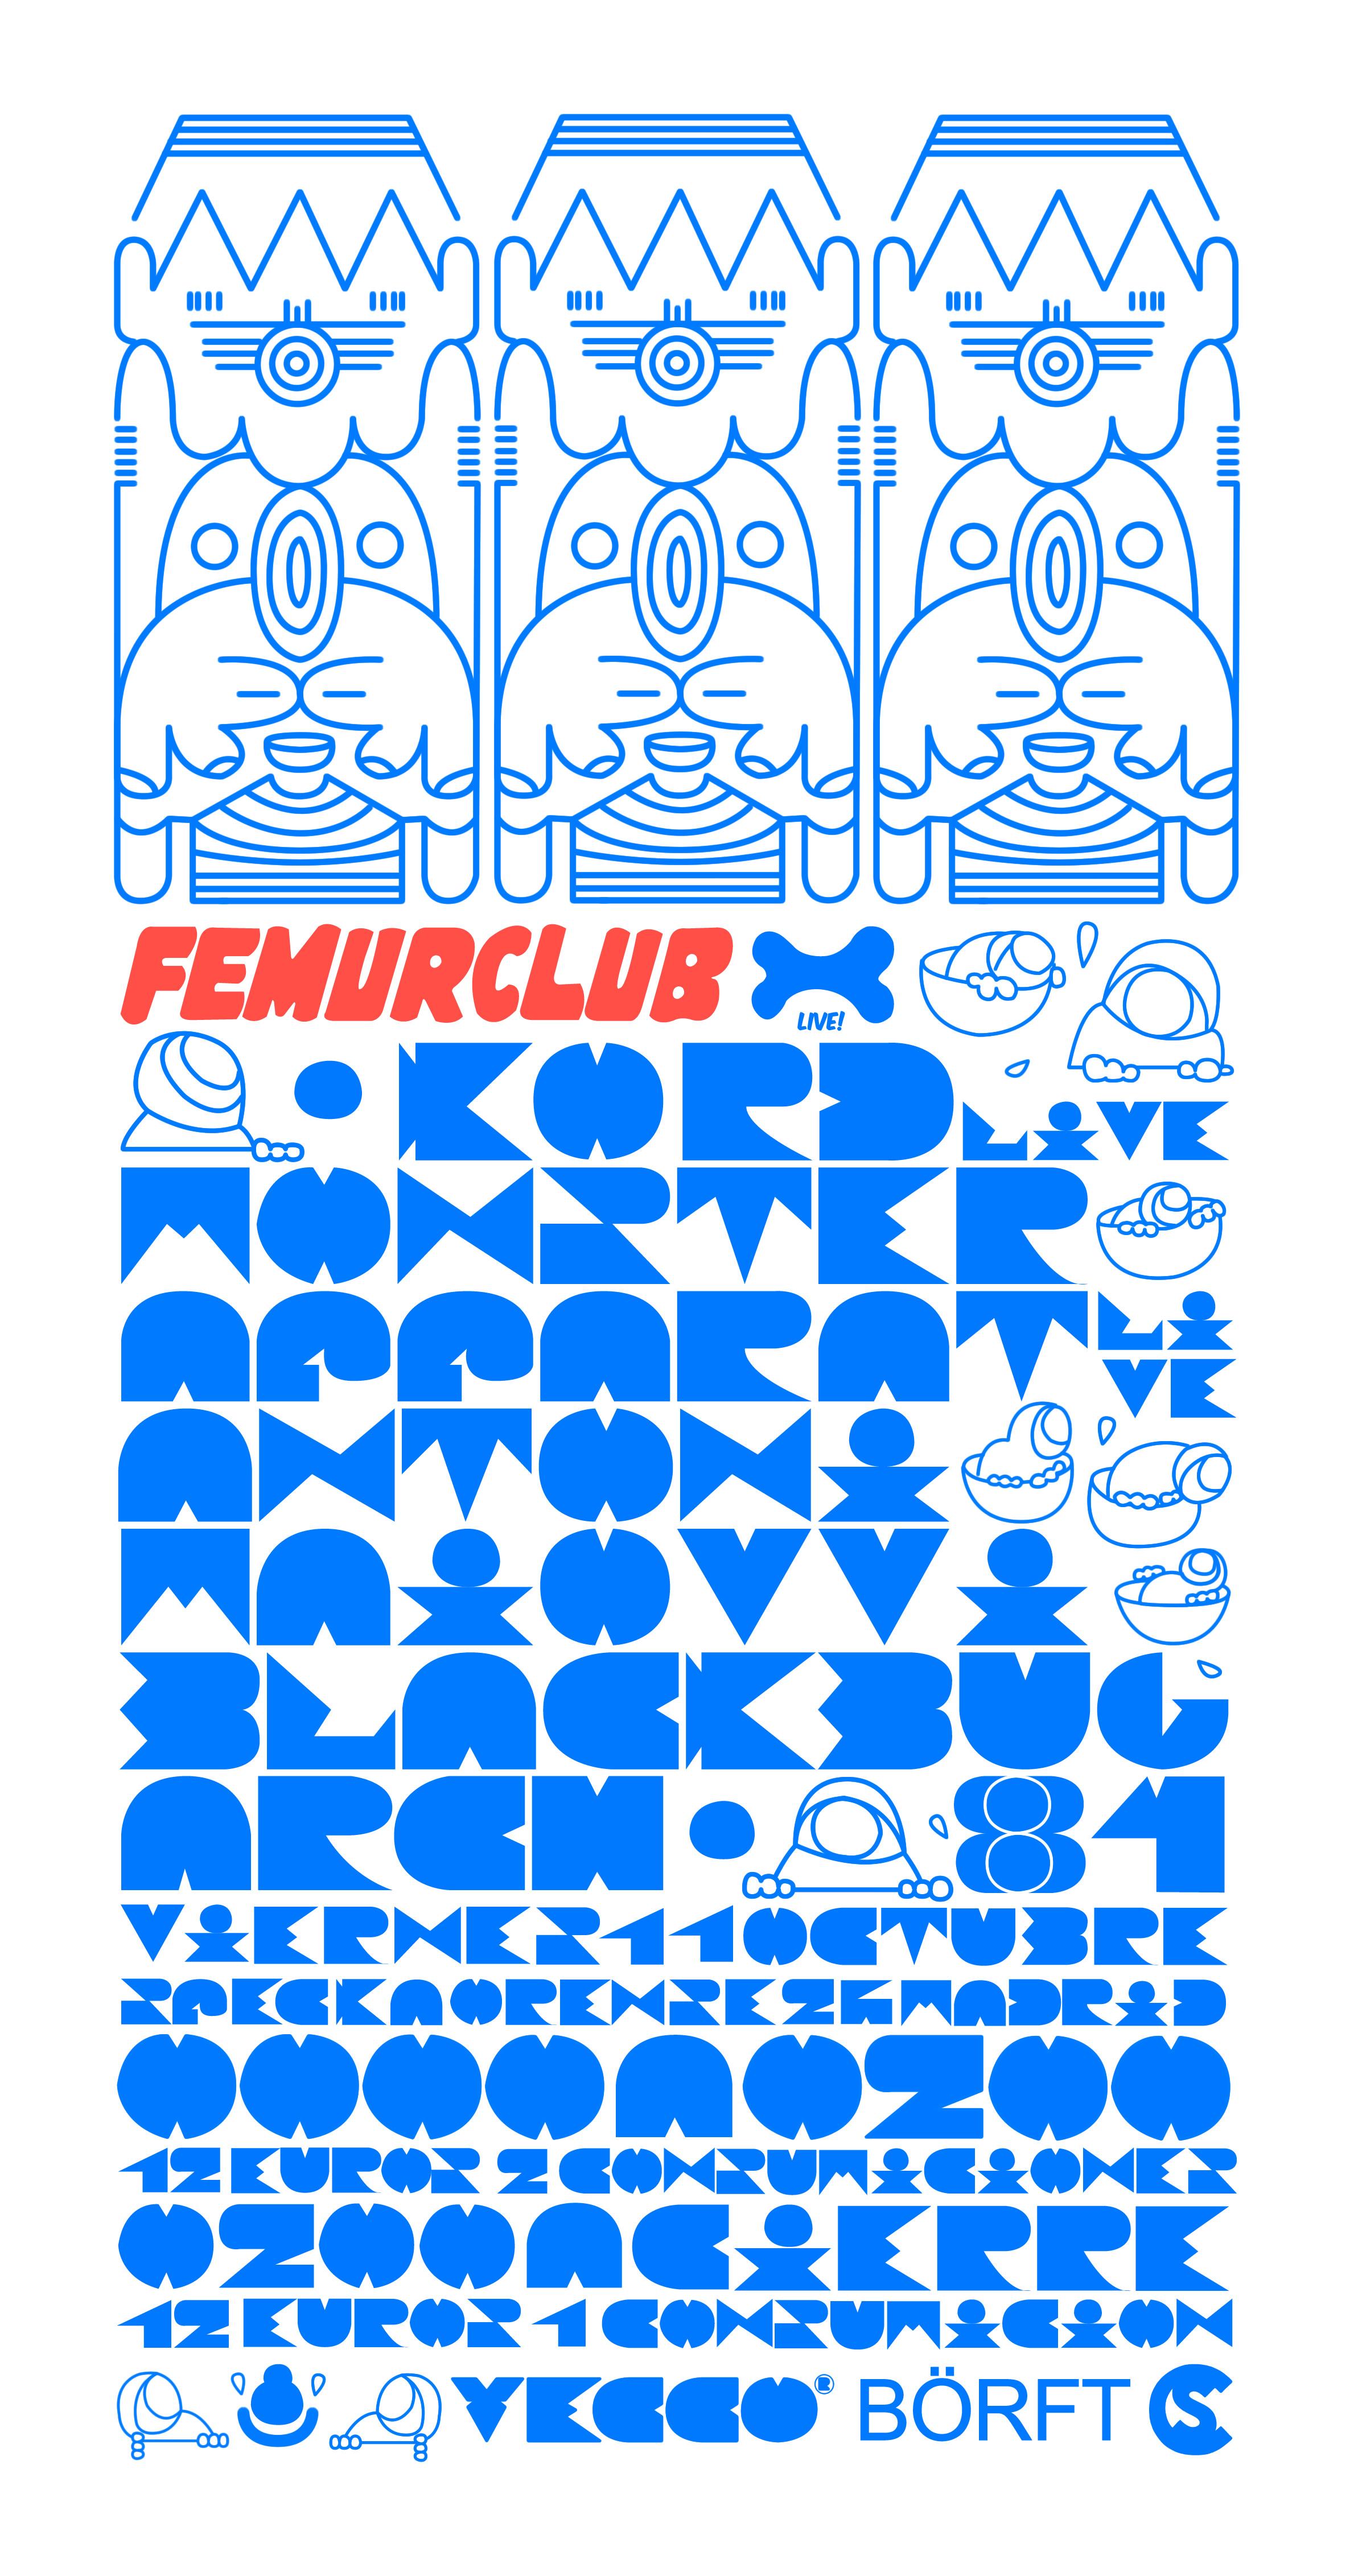 11.10.2013 KORD LIVE! +MONSTER APPARAT LIVE! @ FEMURCLUB Or77